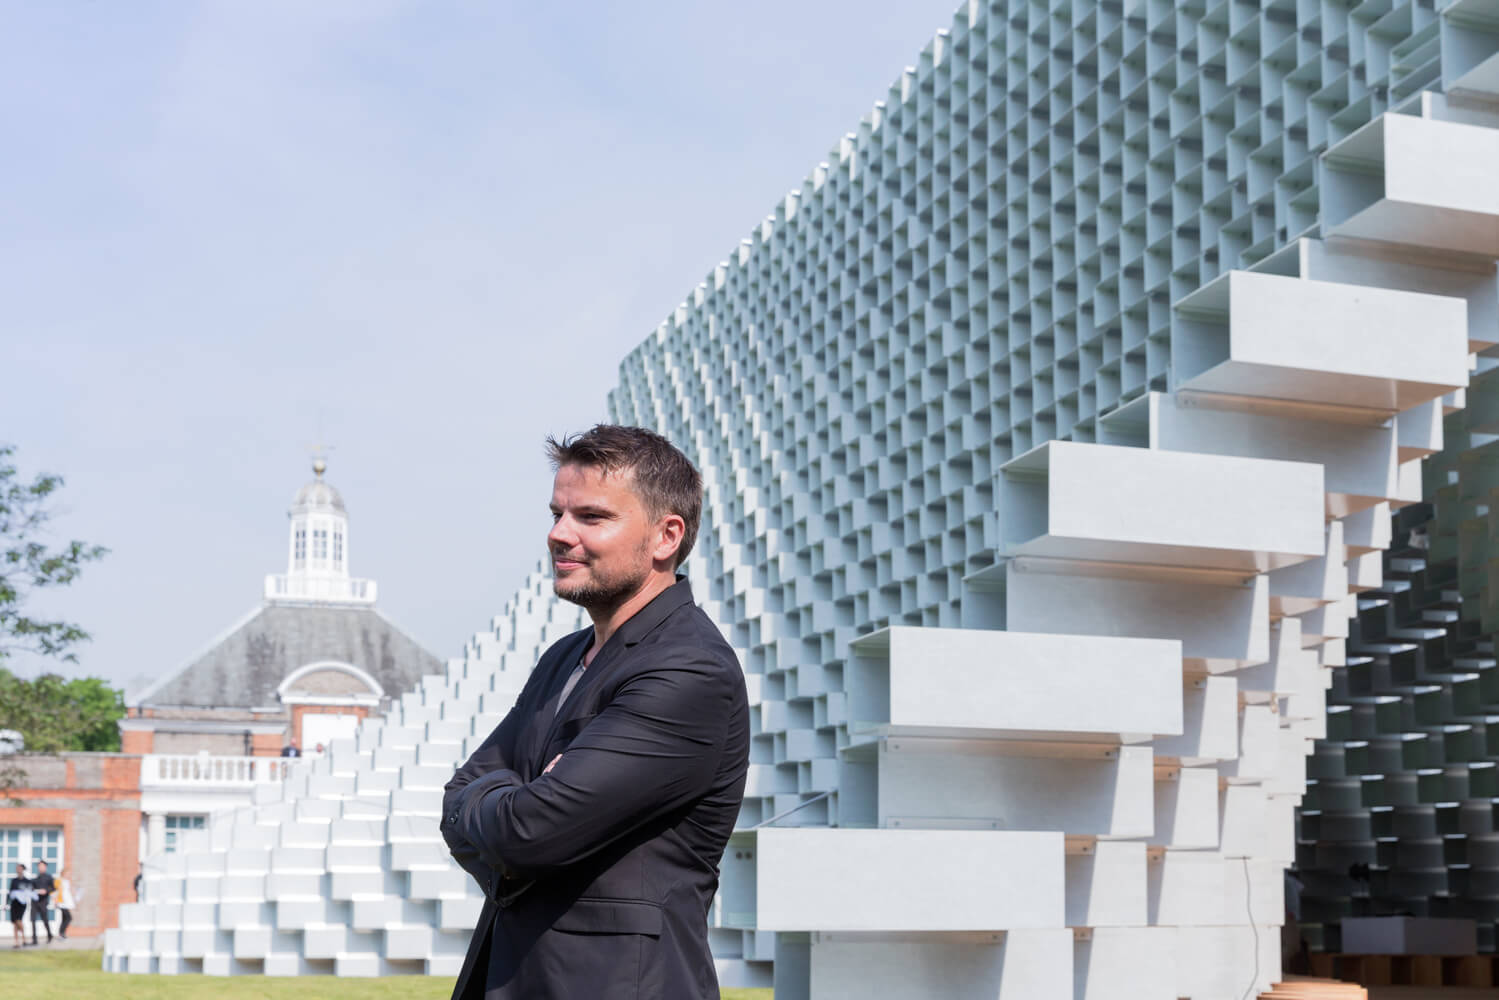 Prémio Kalmanani atribuído ao arquitecto Bjarke Ingels